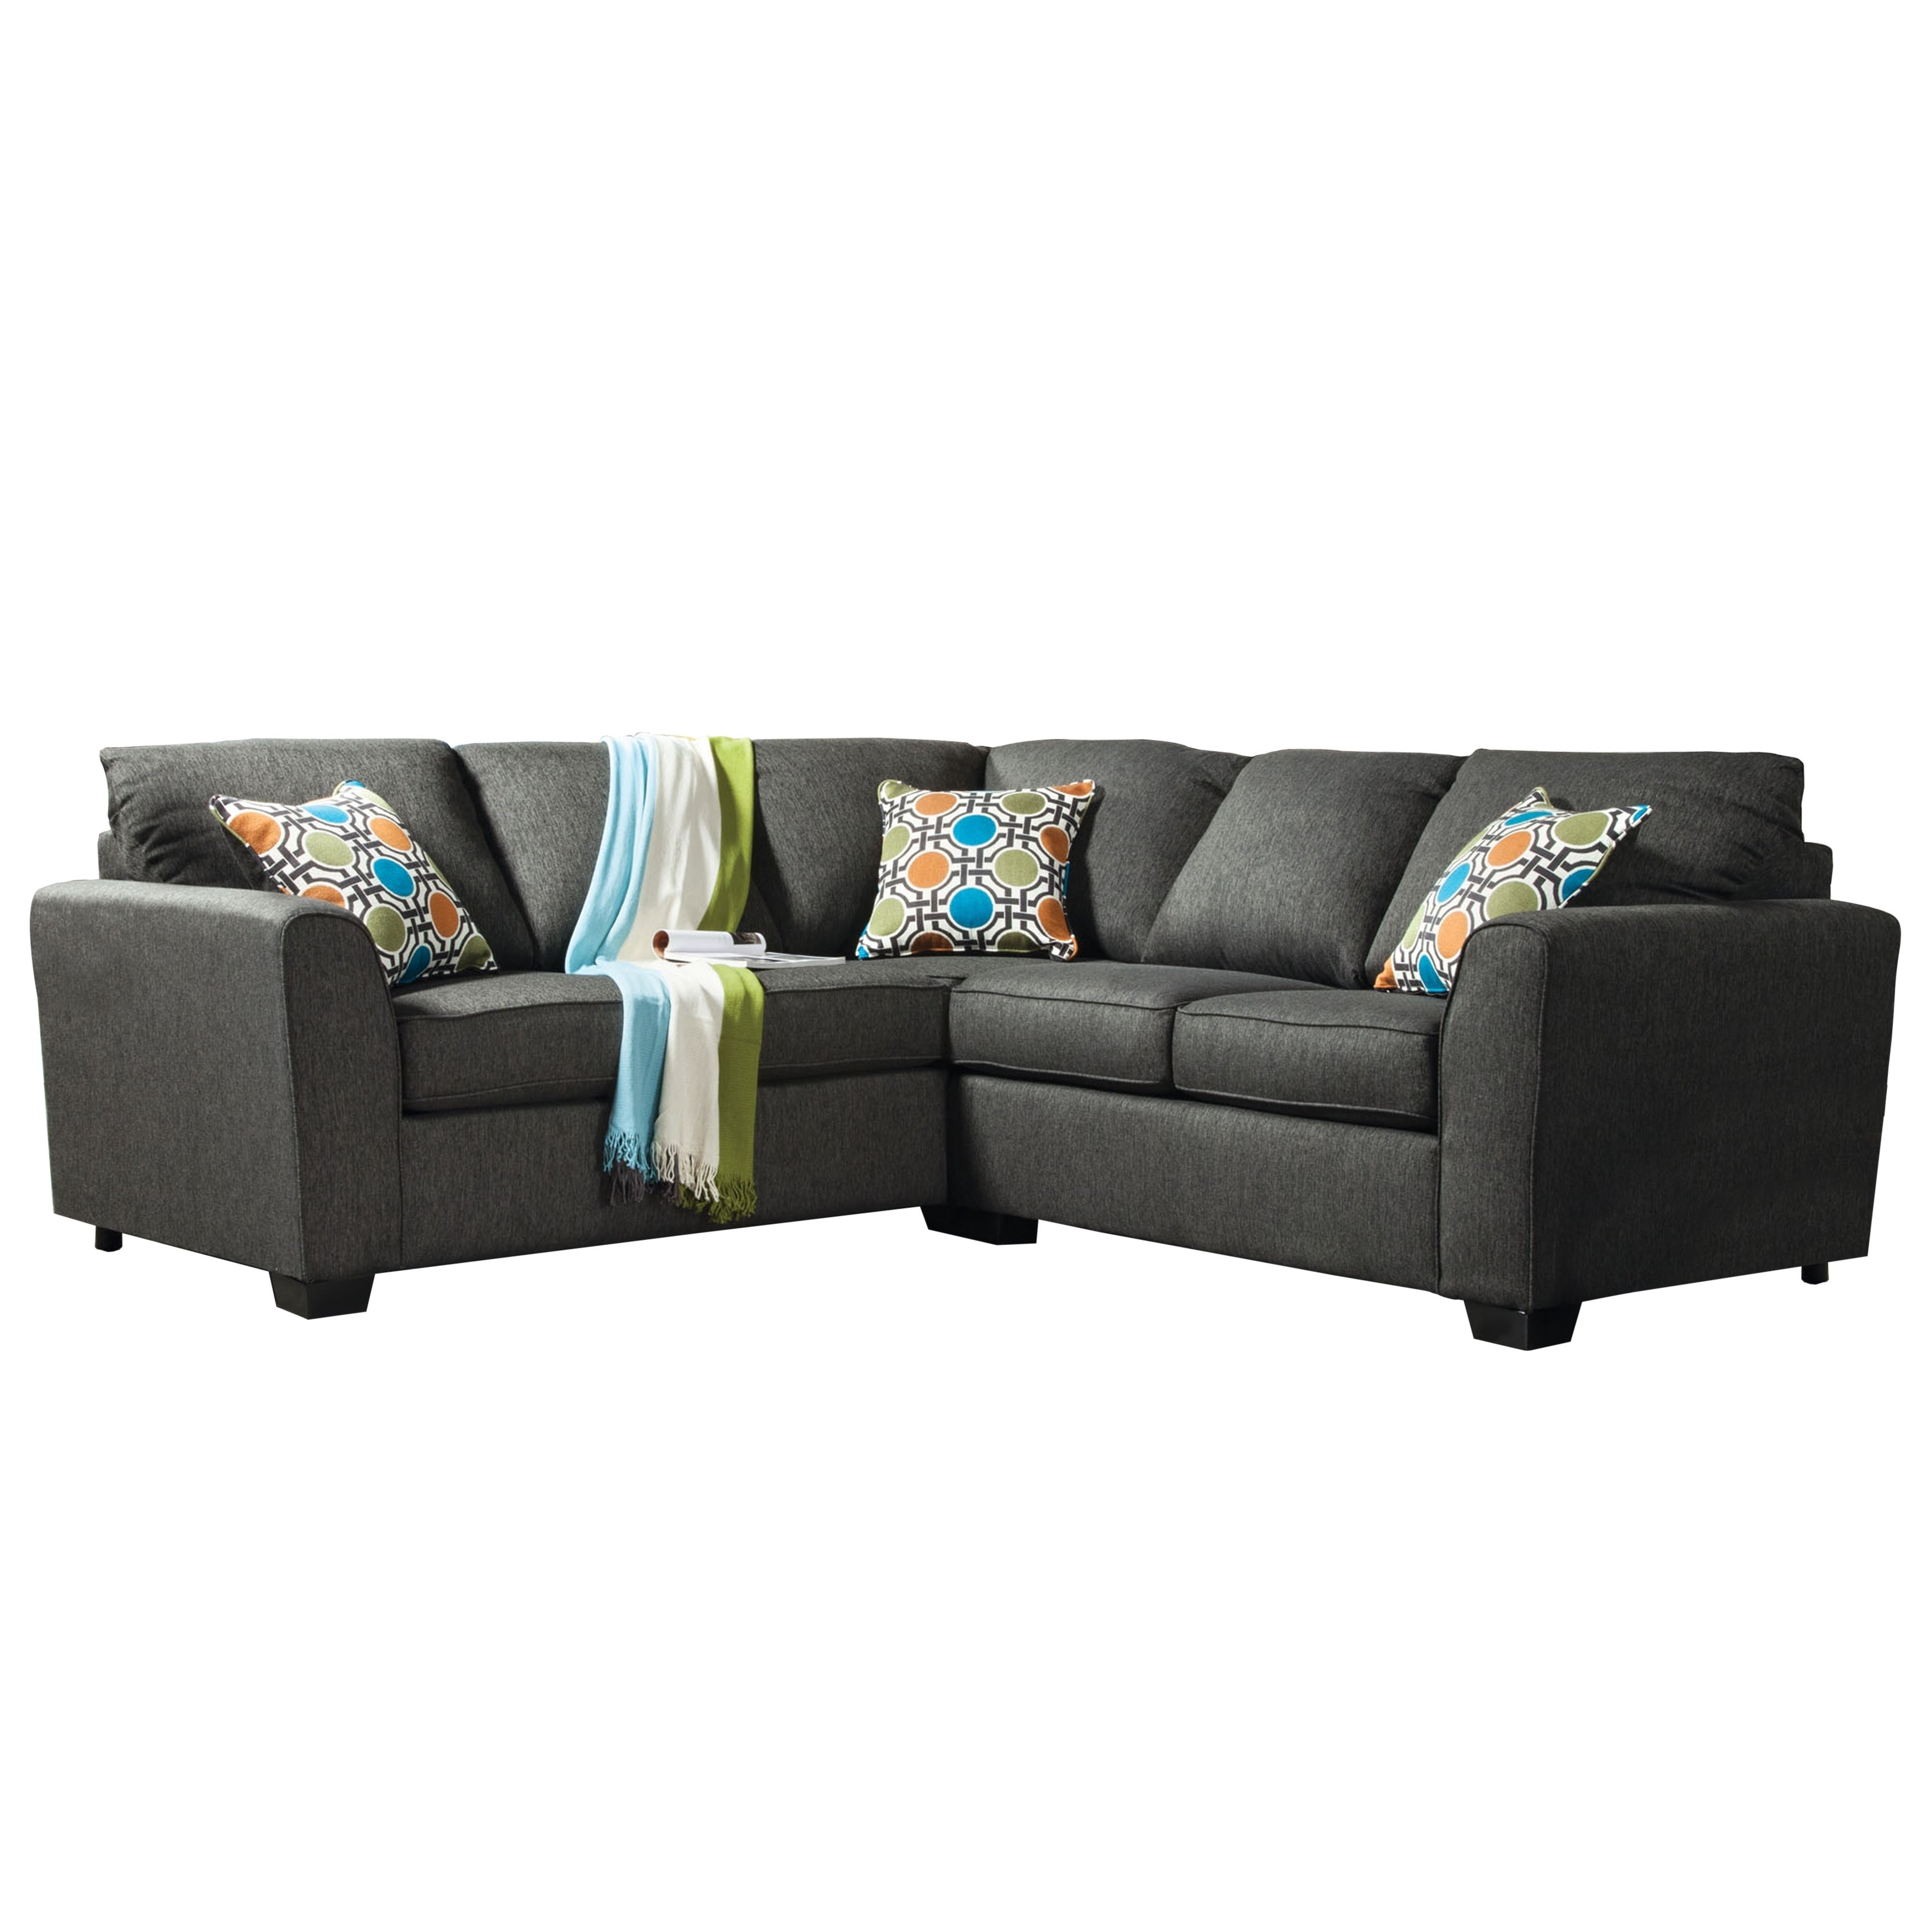 Furniture Of America Playan Grey Tweed Sectional Sofa